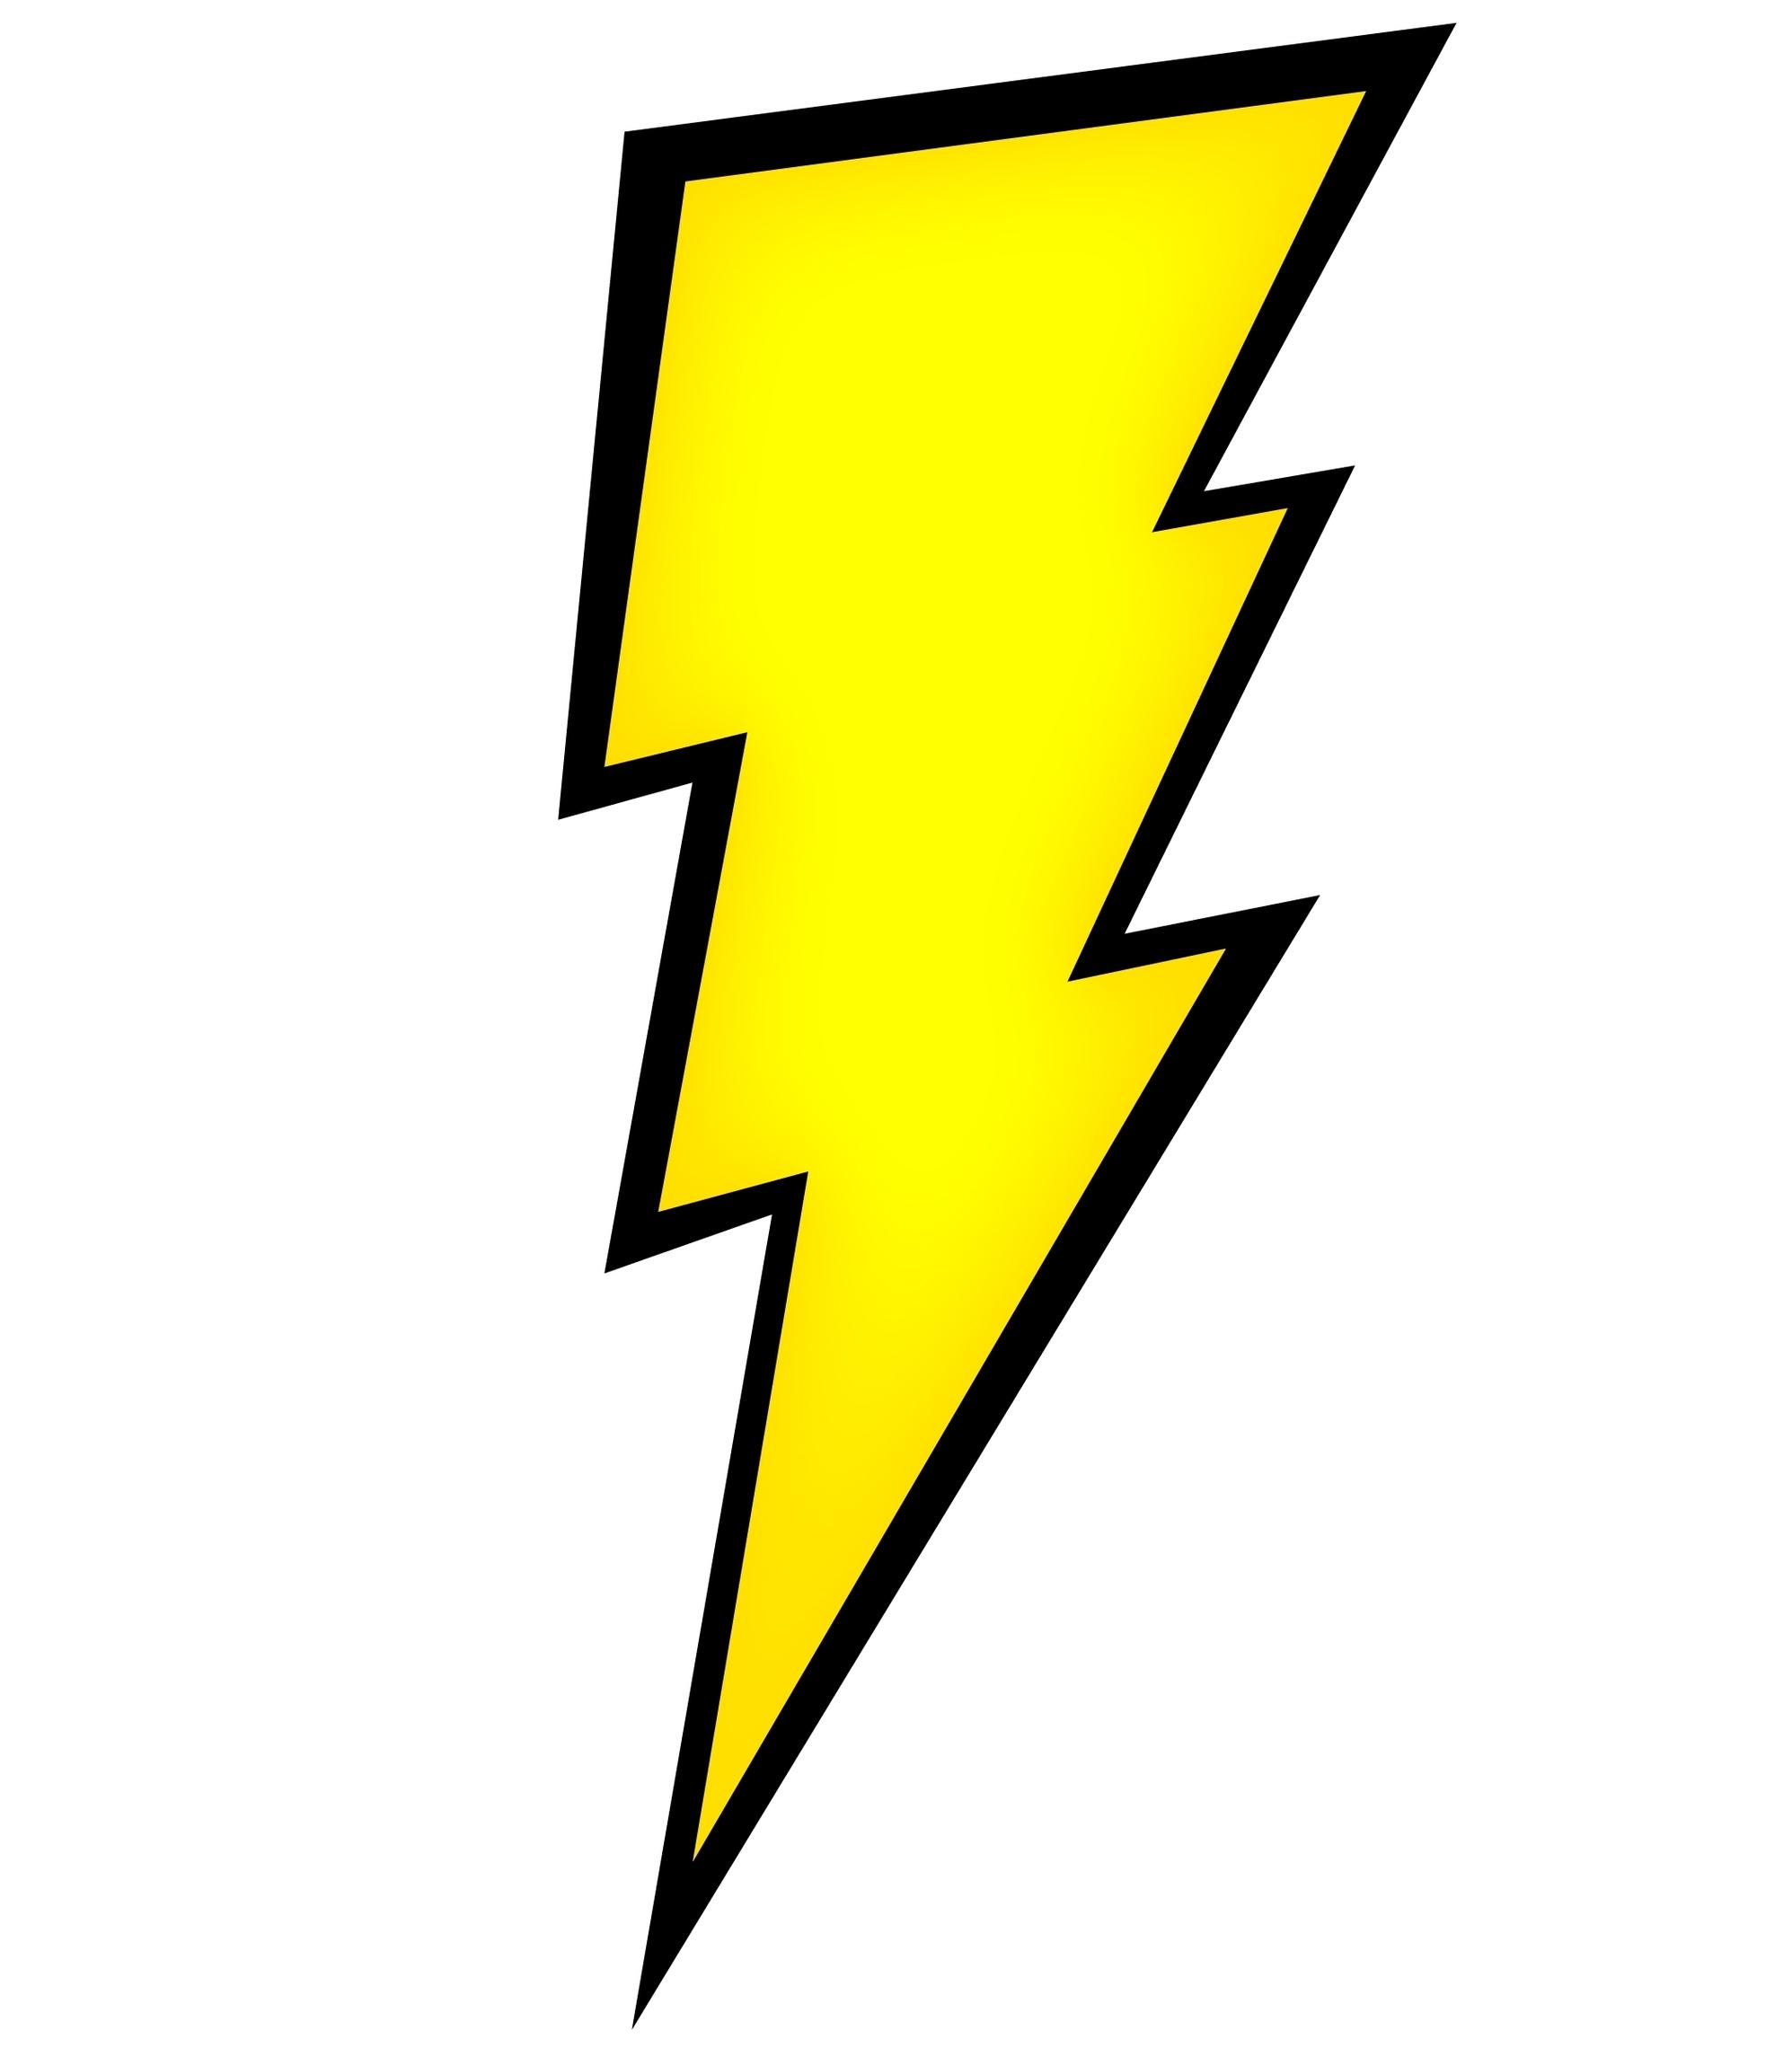 Thunder clipart lightning bolt Of lightning Collection Clipart Black